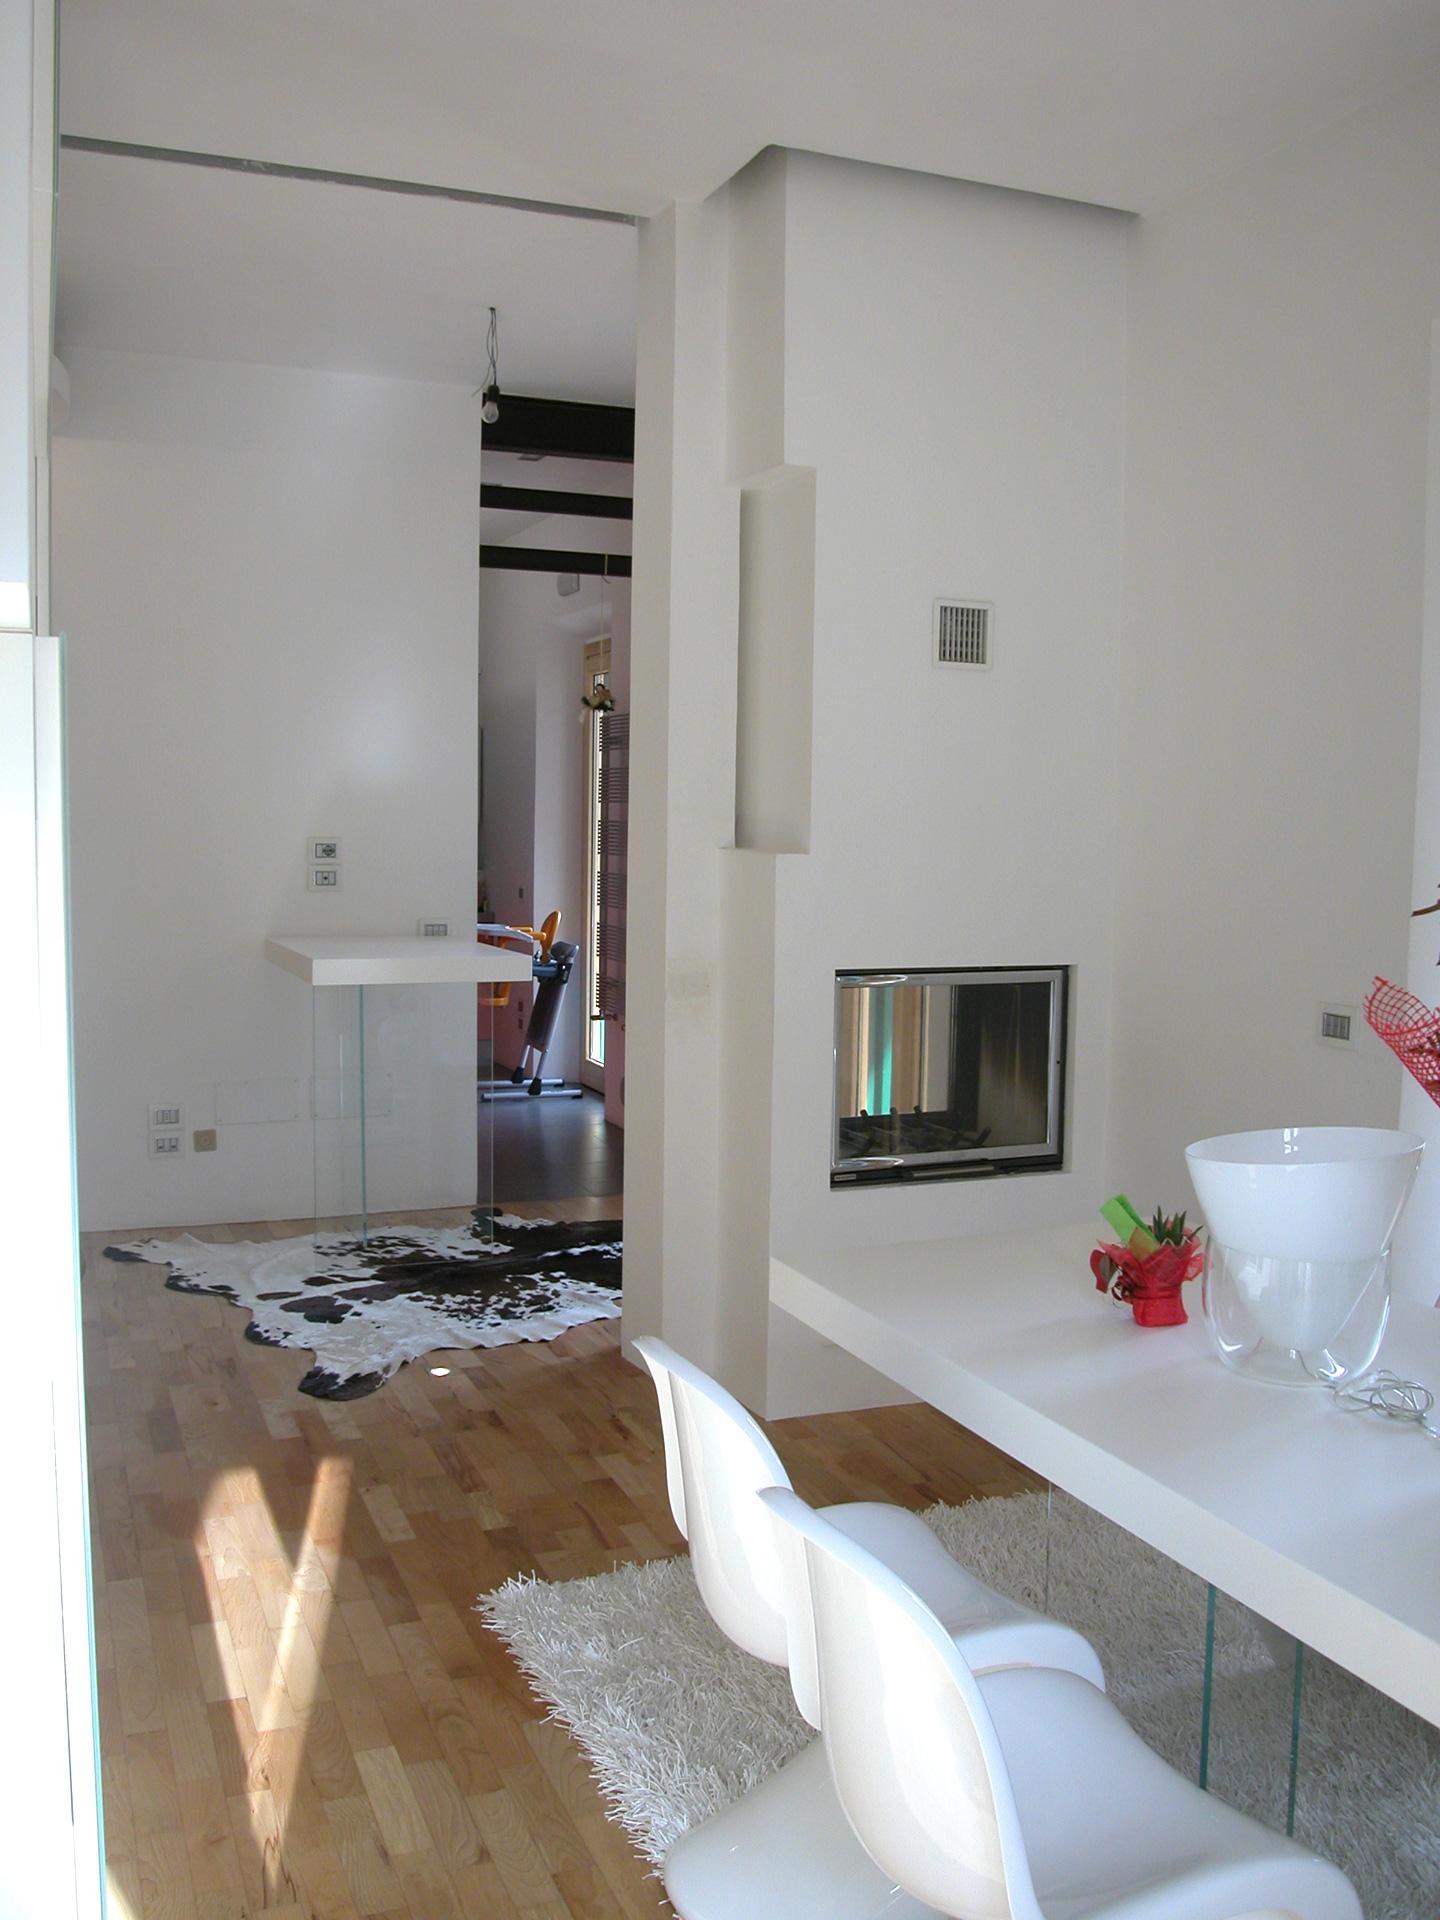 Mobili di design a casa di raffaele e benedetta una for Outlet di mobili di design